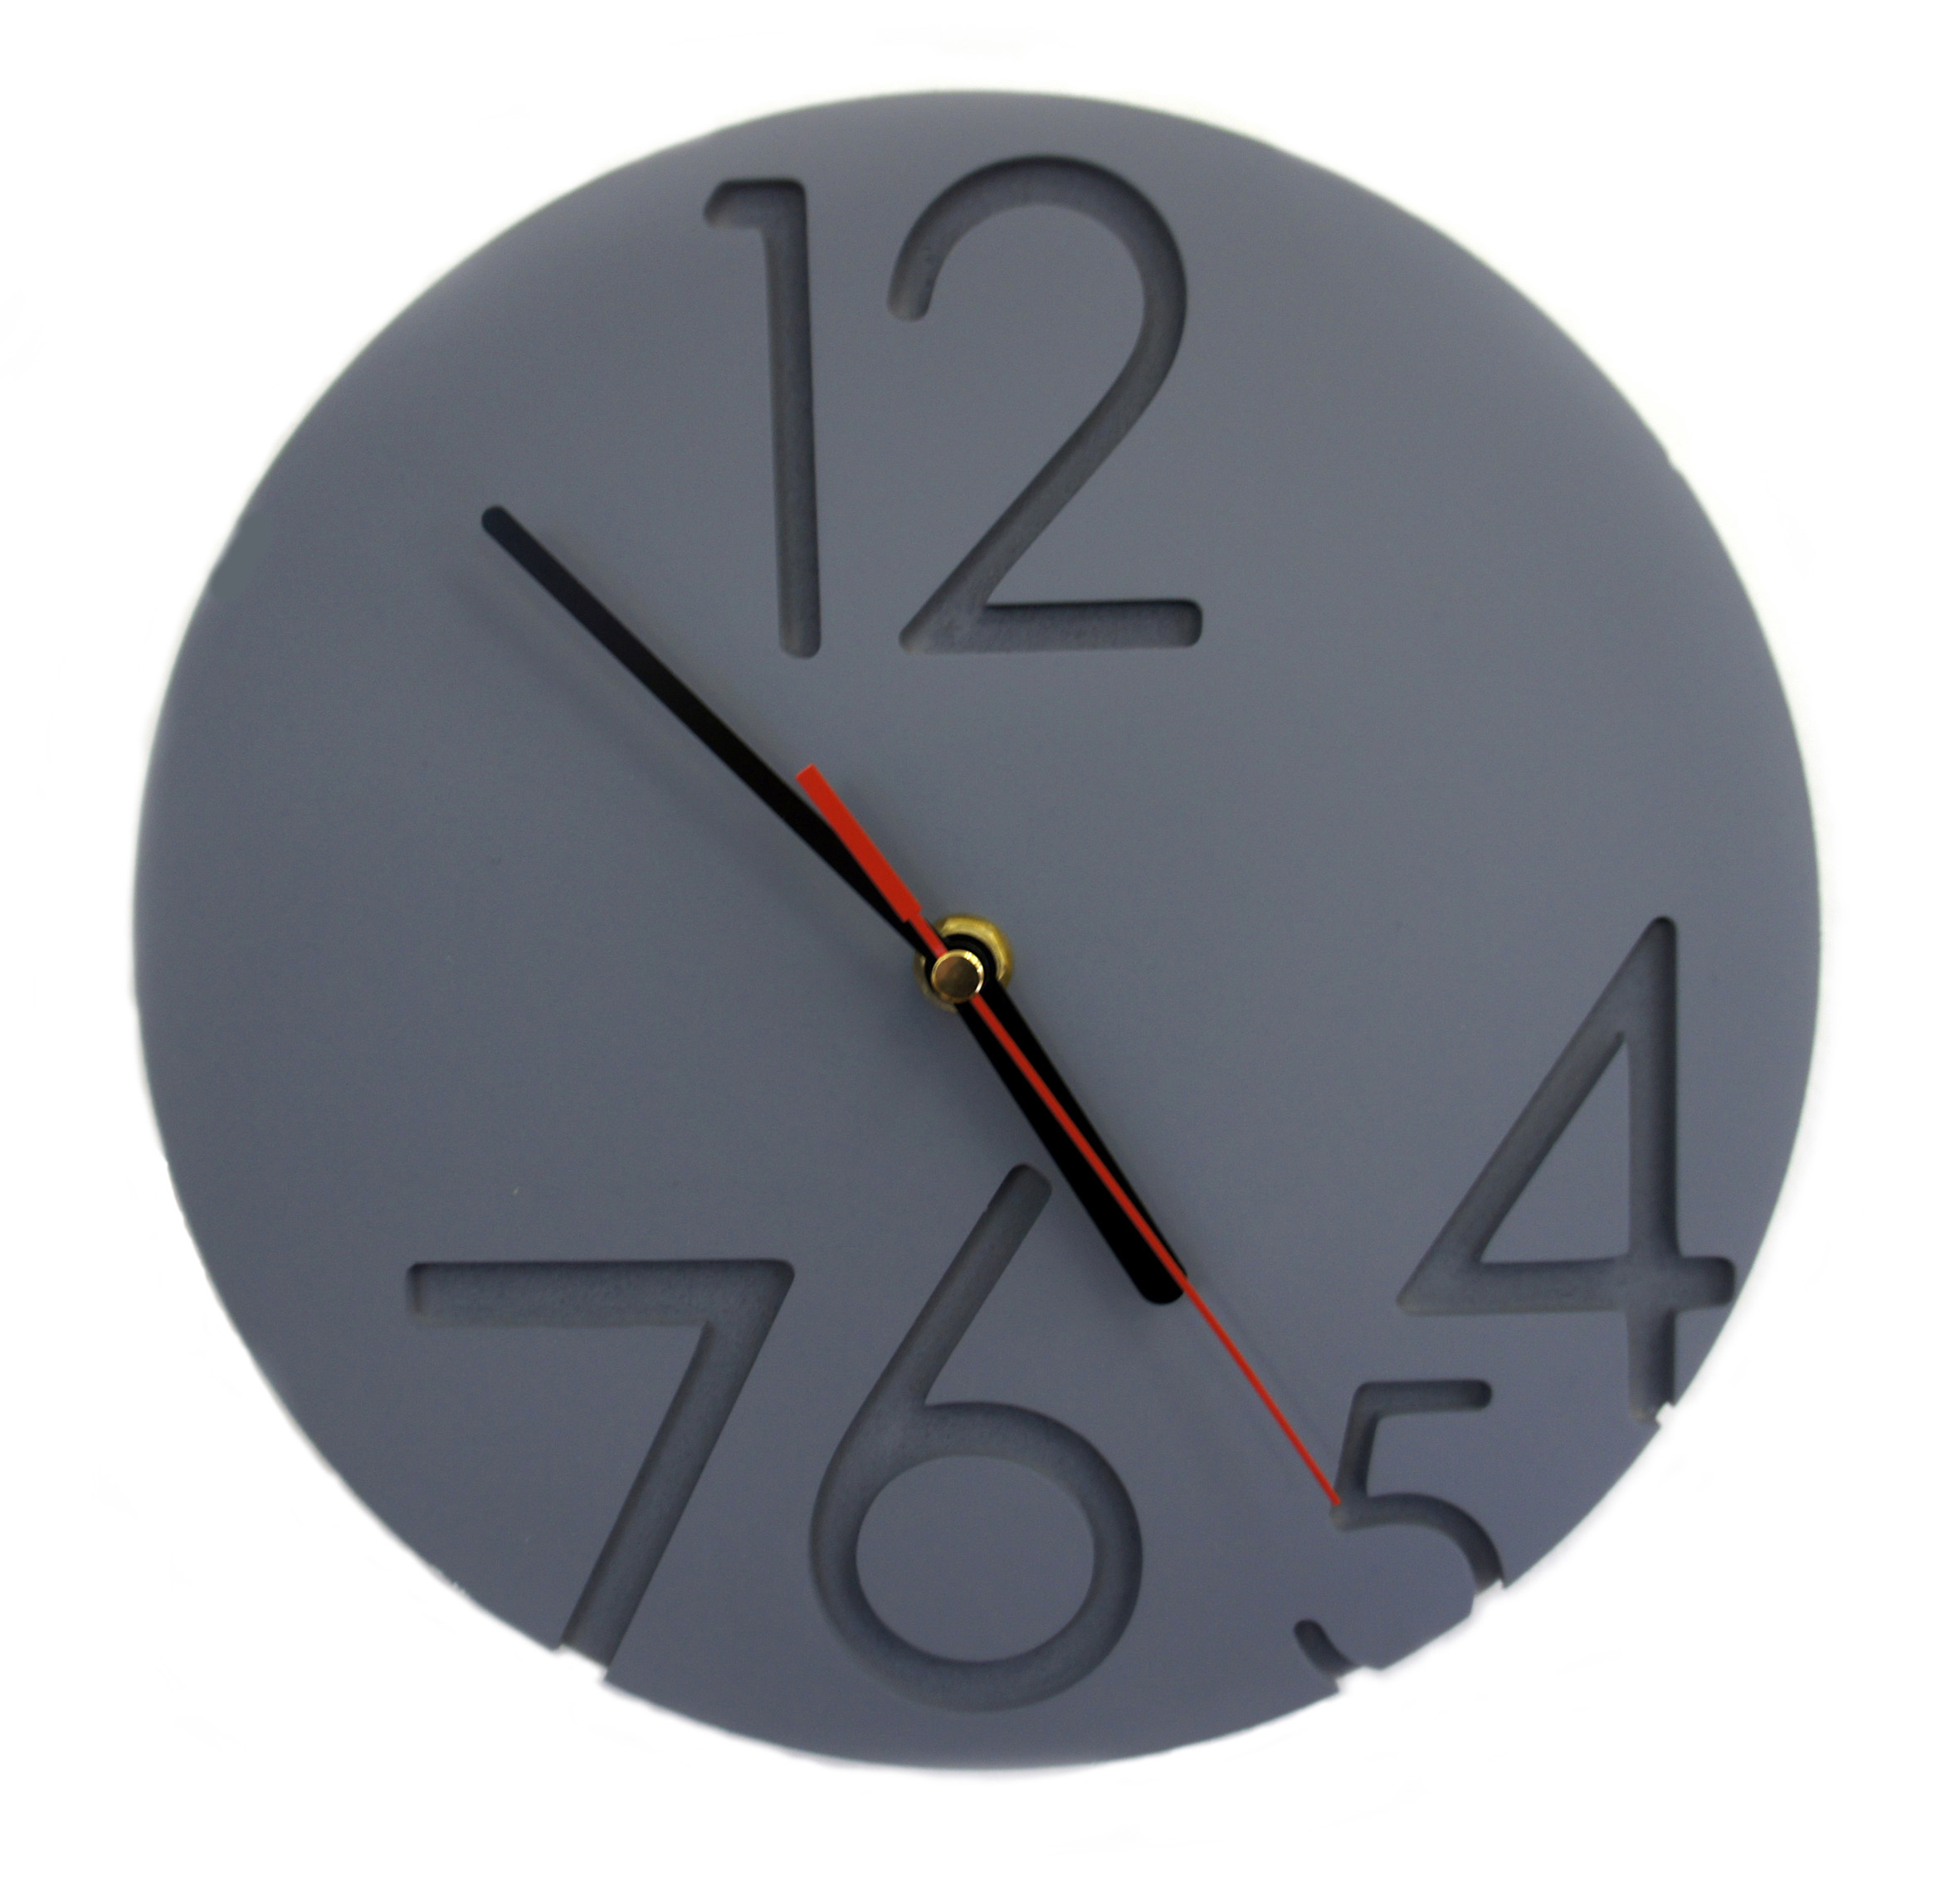 Wall clock kitchen photo - 2